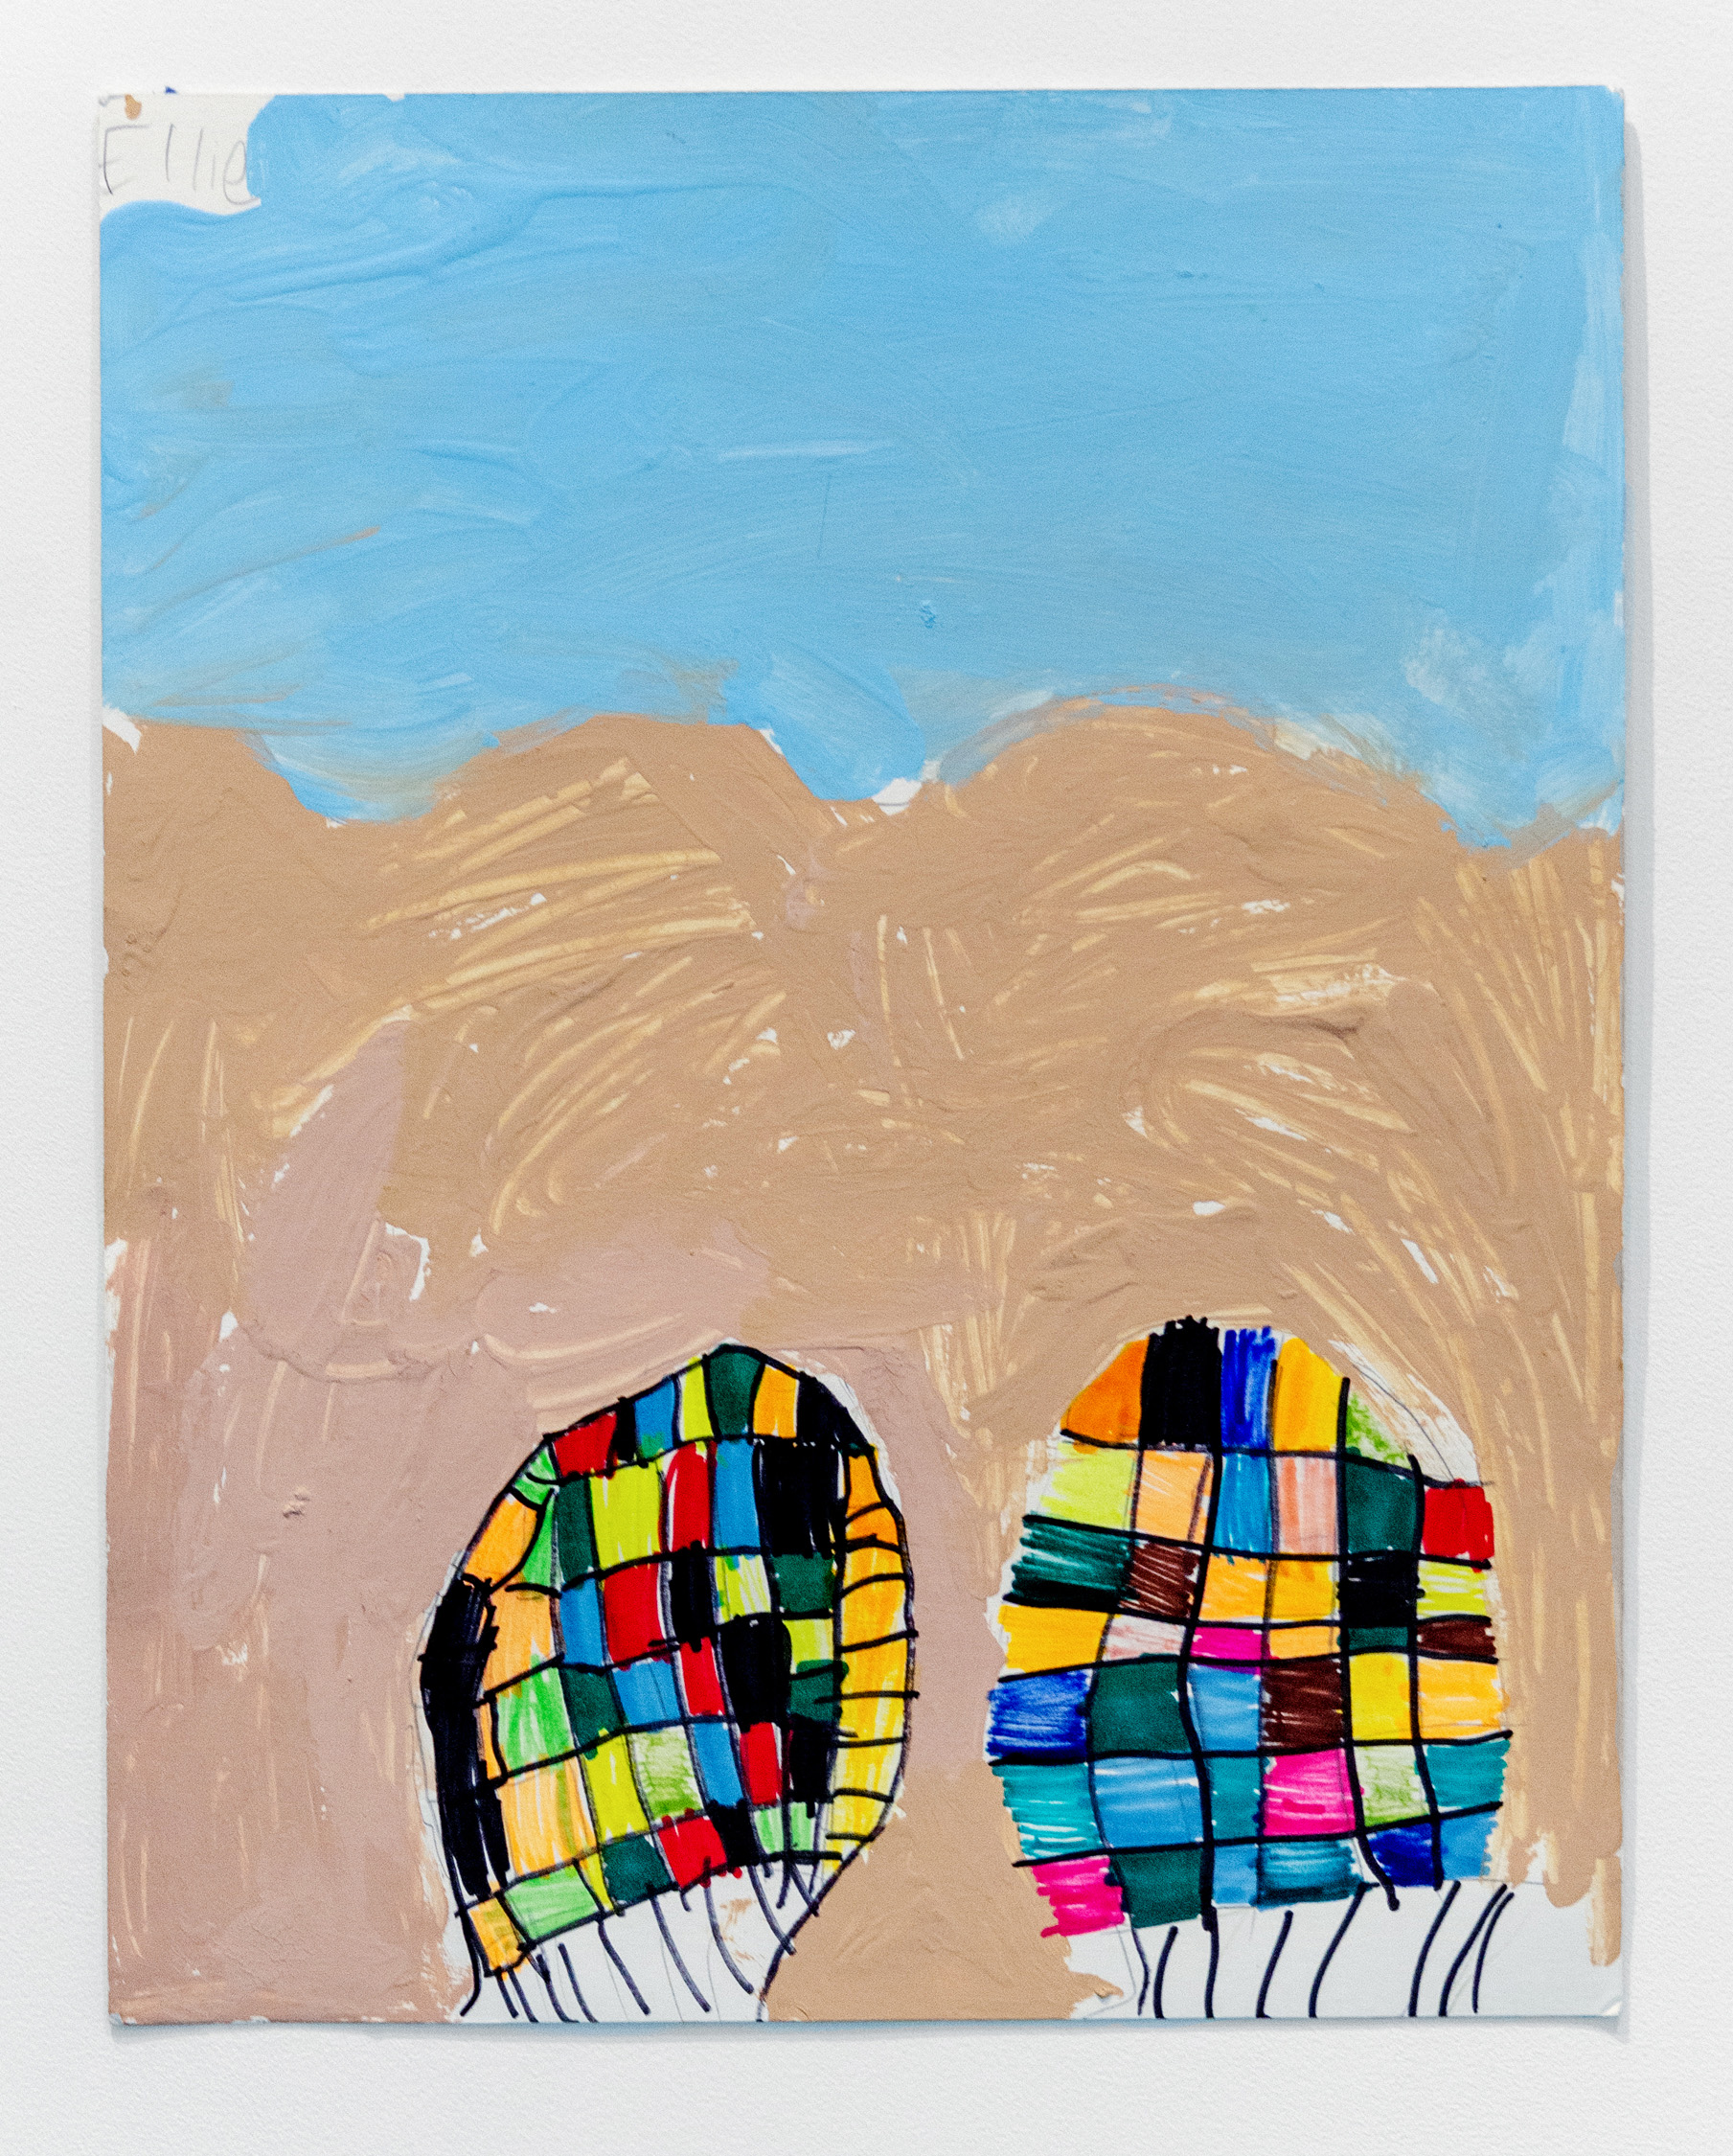 Ellie Rosenblatt,  Feet on the Beach , 2019, Acrylic, marker and pencil on paper, 14 x 11 inches (35.5 x 28 cm)